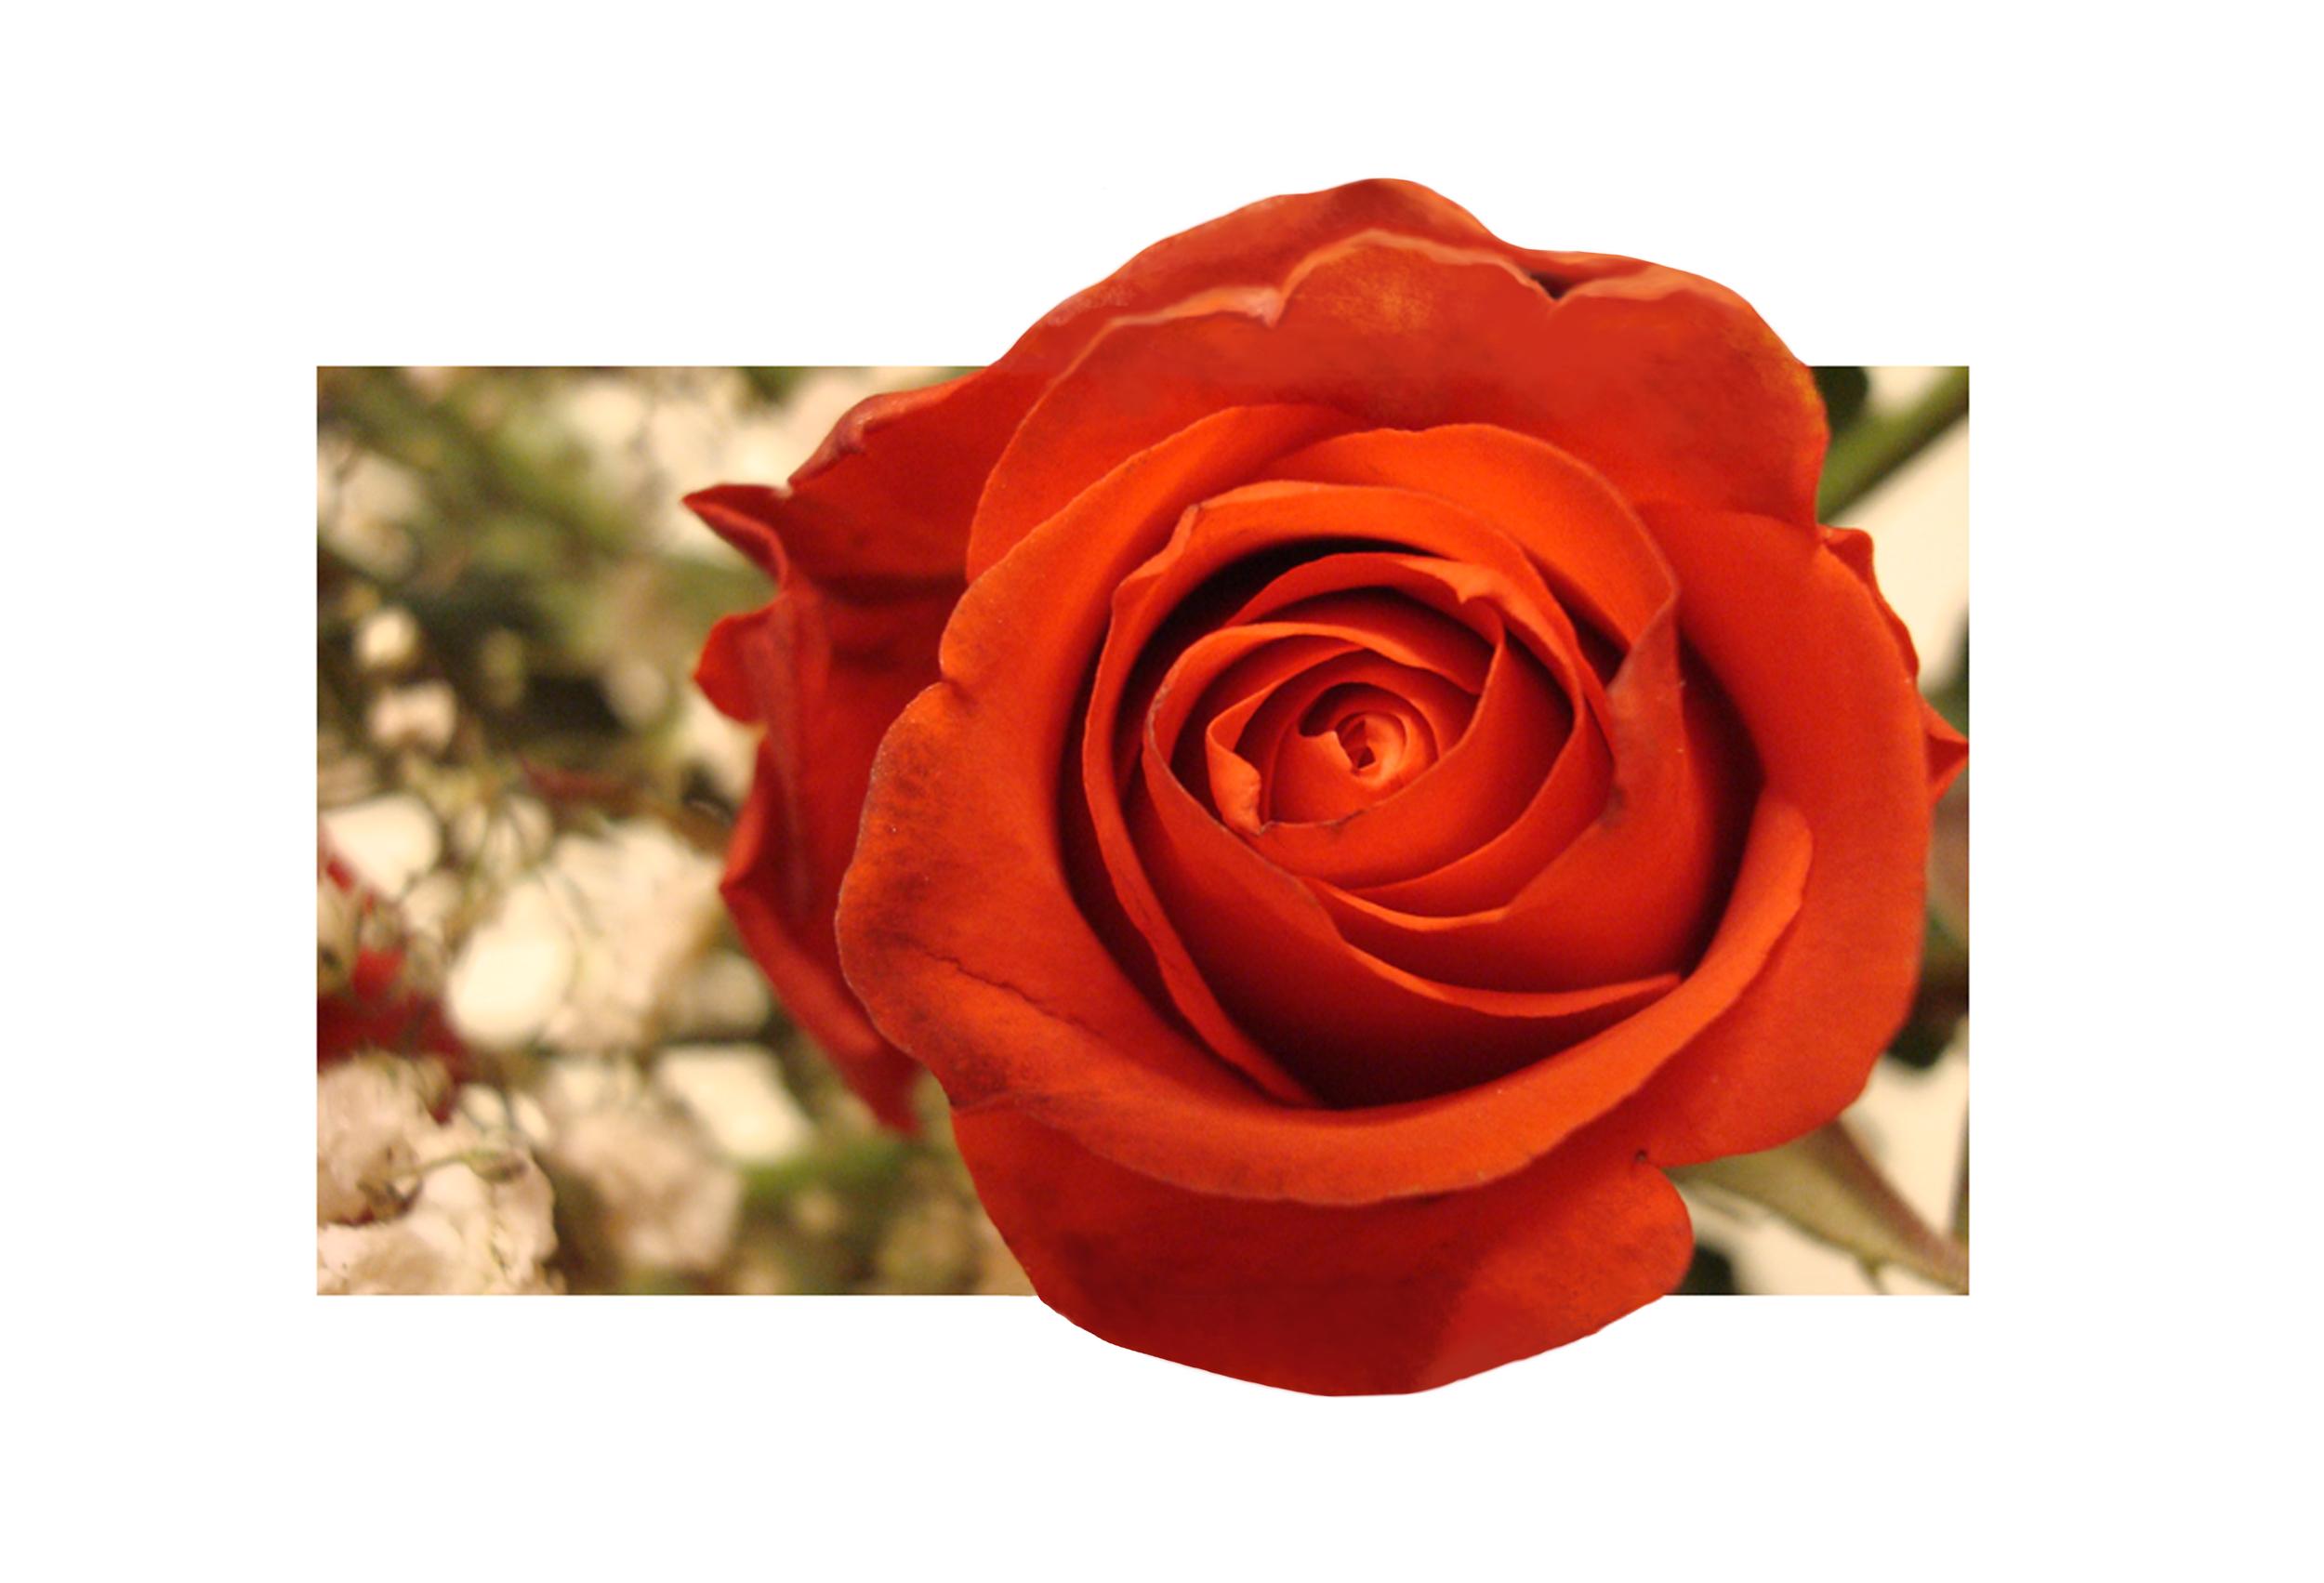 """The Rose"" - Jess Rudolph Photography: www.jessrudolph.com"